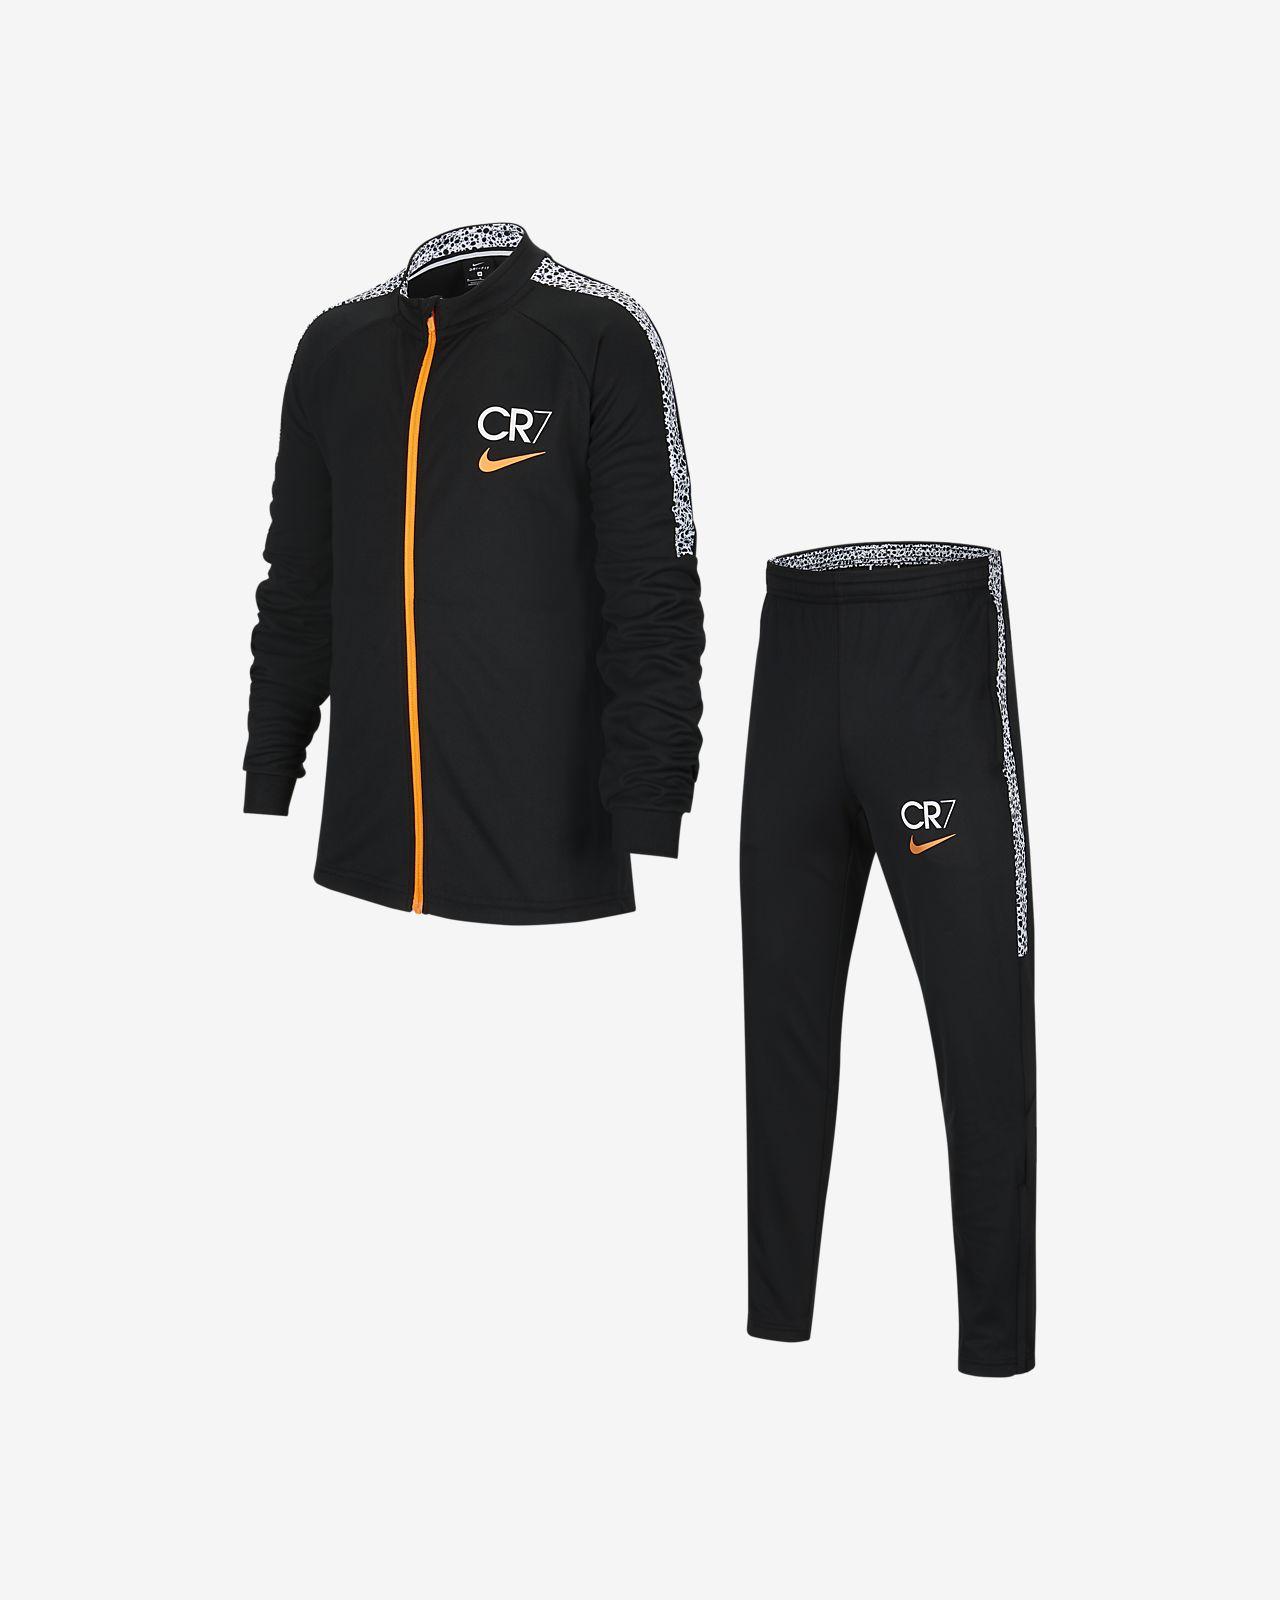 Nike Dri-FIT CR7 大童(男孩)针织足球运动套装